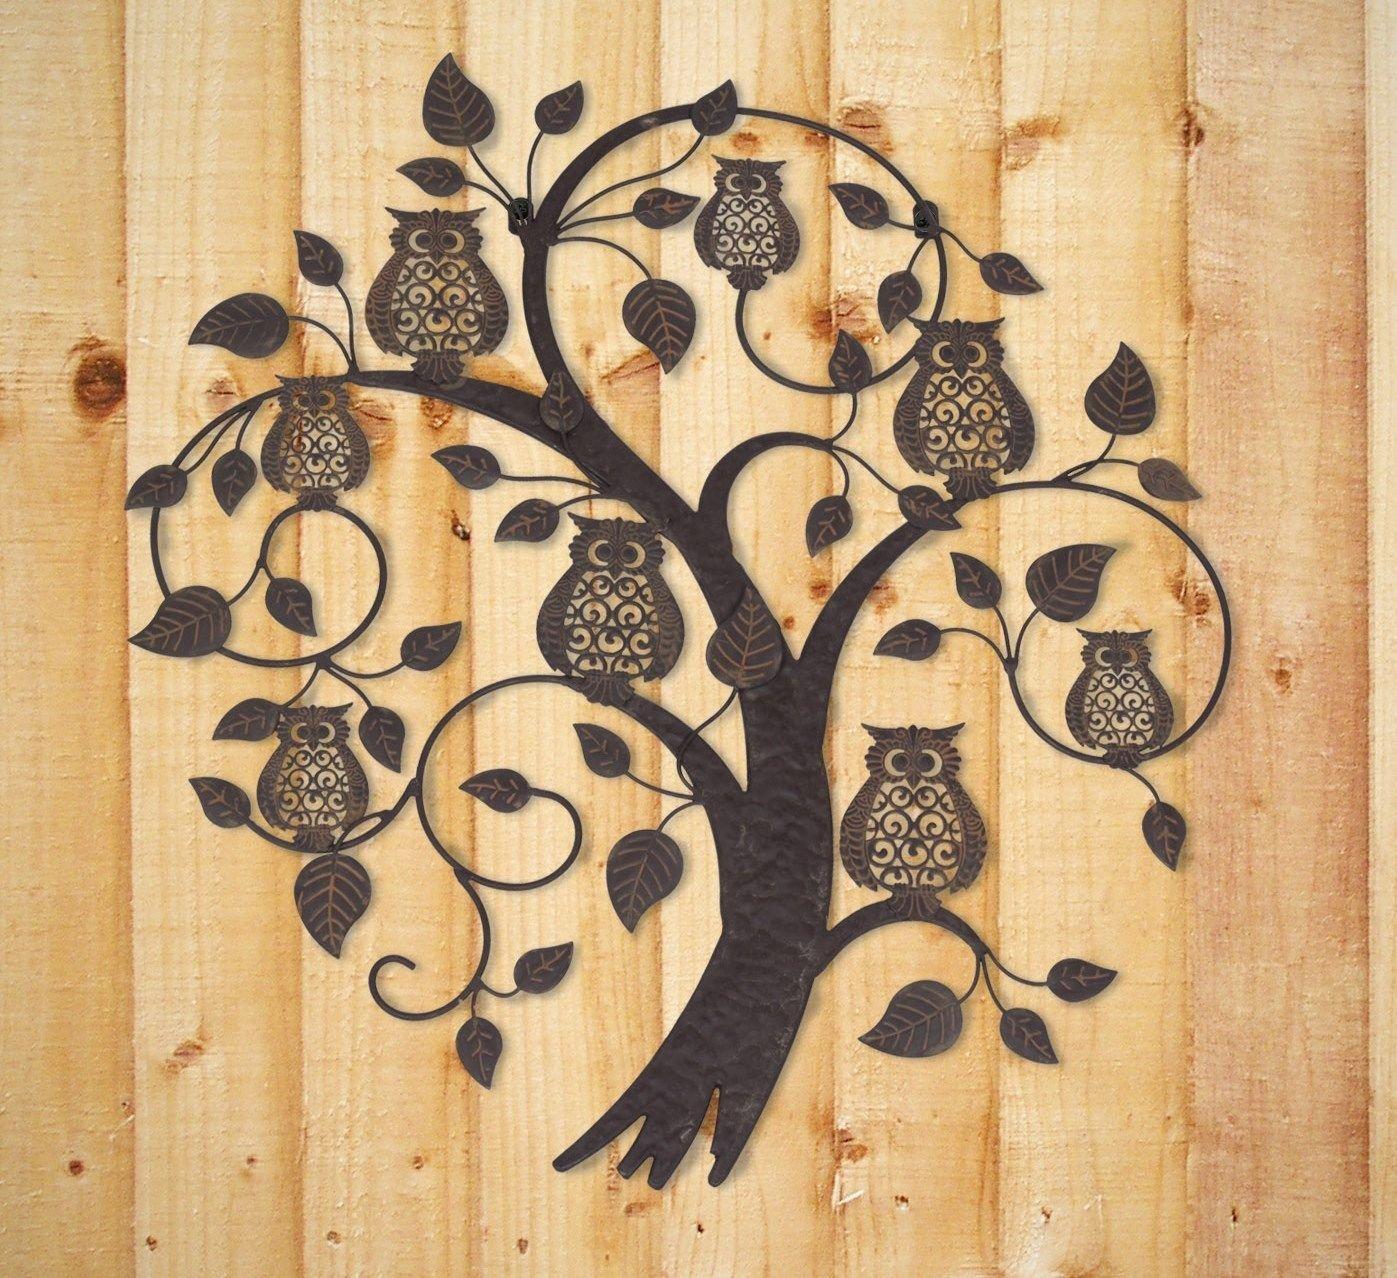 La Hacienda Treetop Owls Metal Wall Art: Amazon.co.uk: Garden & Outdoors